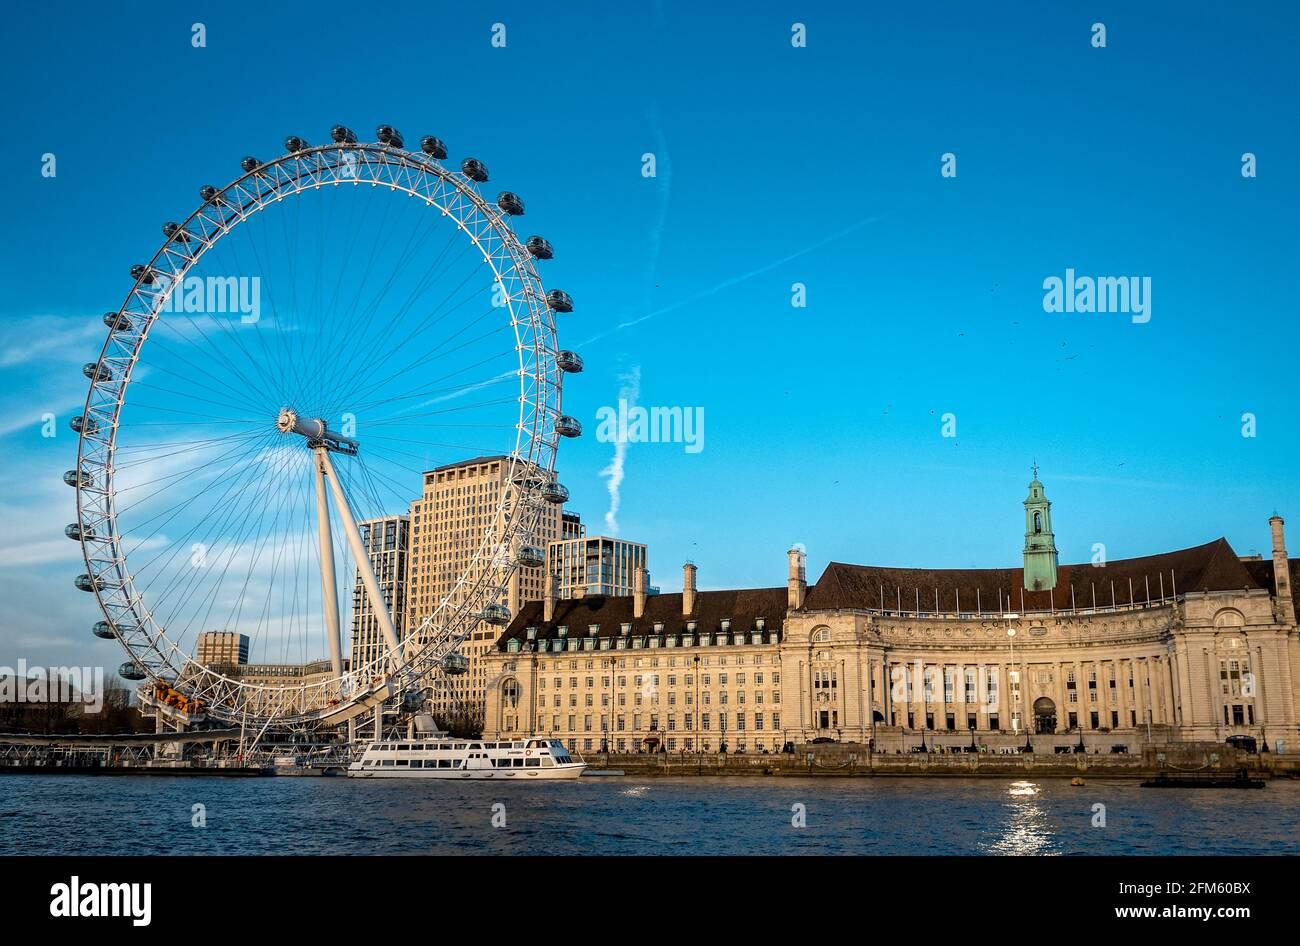 The London Eye and County Hall, Lambeth, London, England Stockfoto